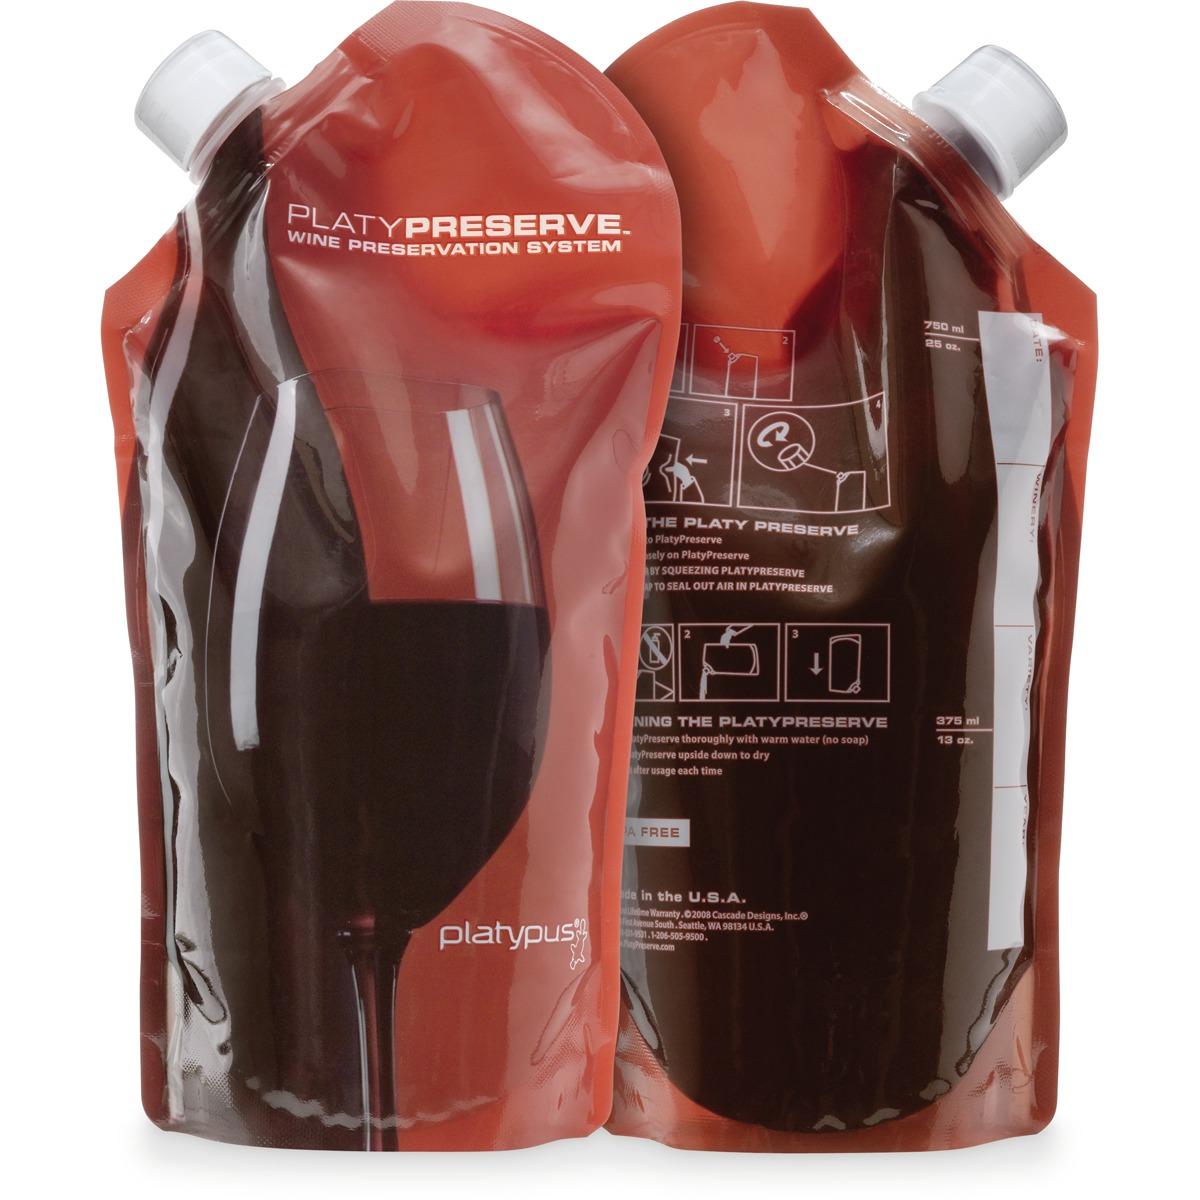 Platypus Platy Preserve – 4 Pack 800 ml-30